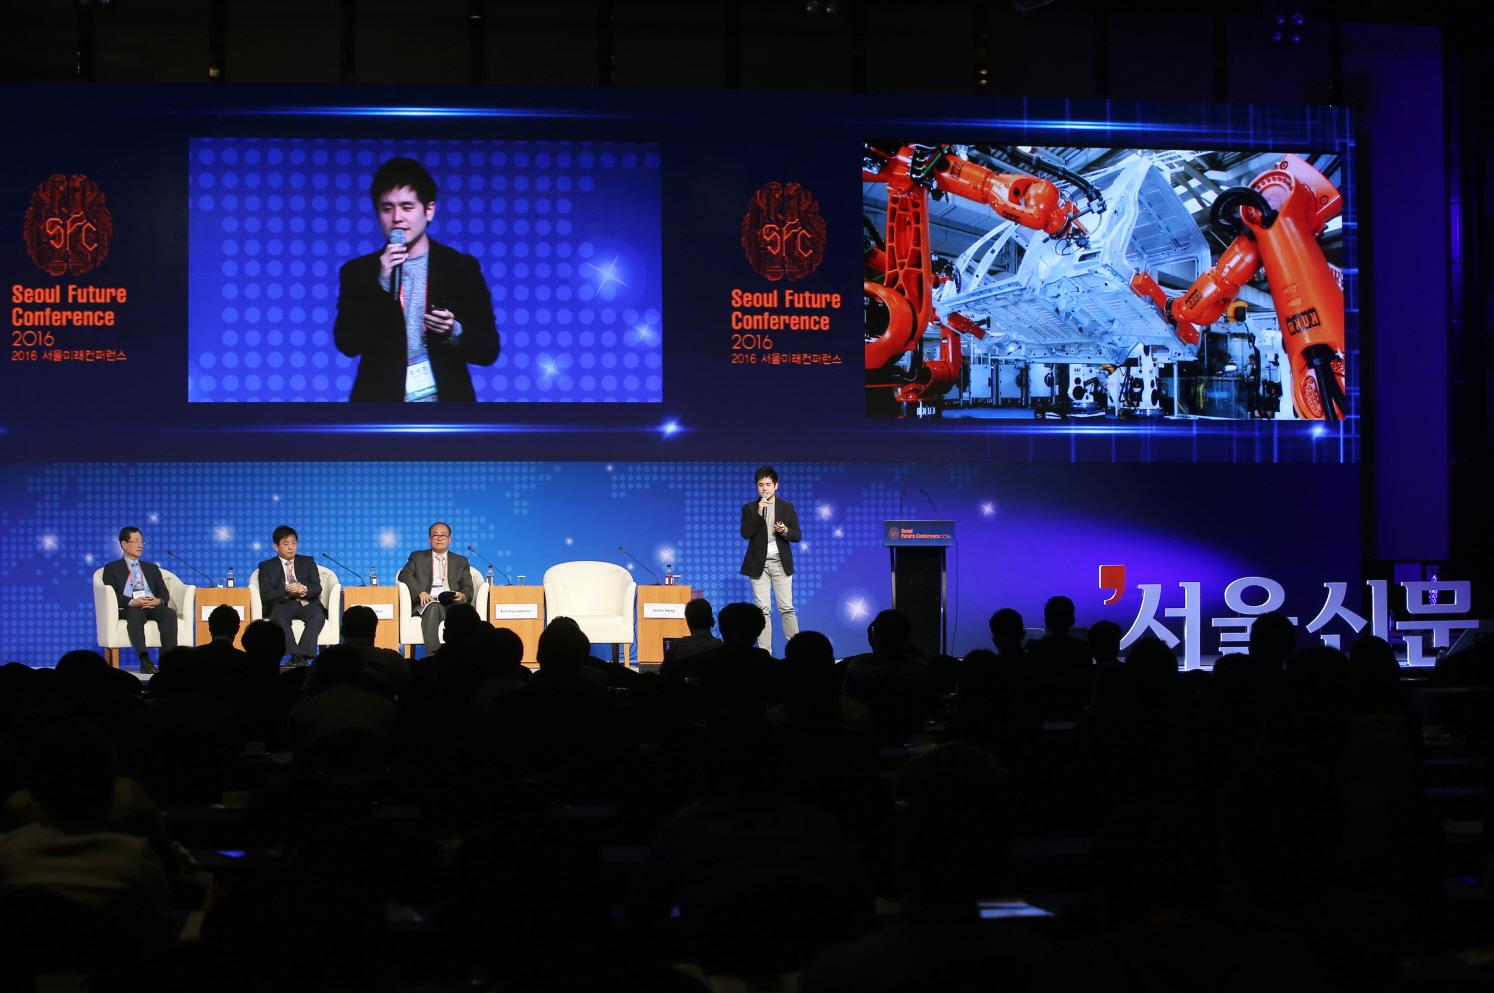 2016 SFC Session II 홍세화 바이로봇 공동창업자